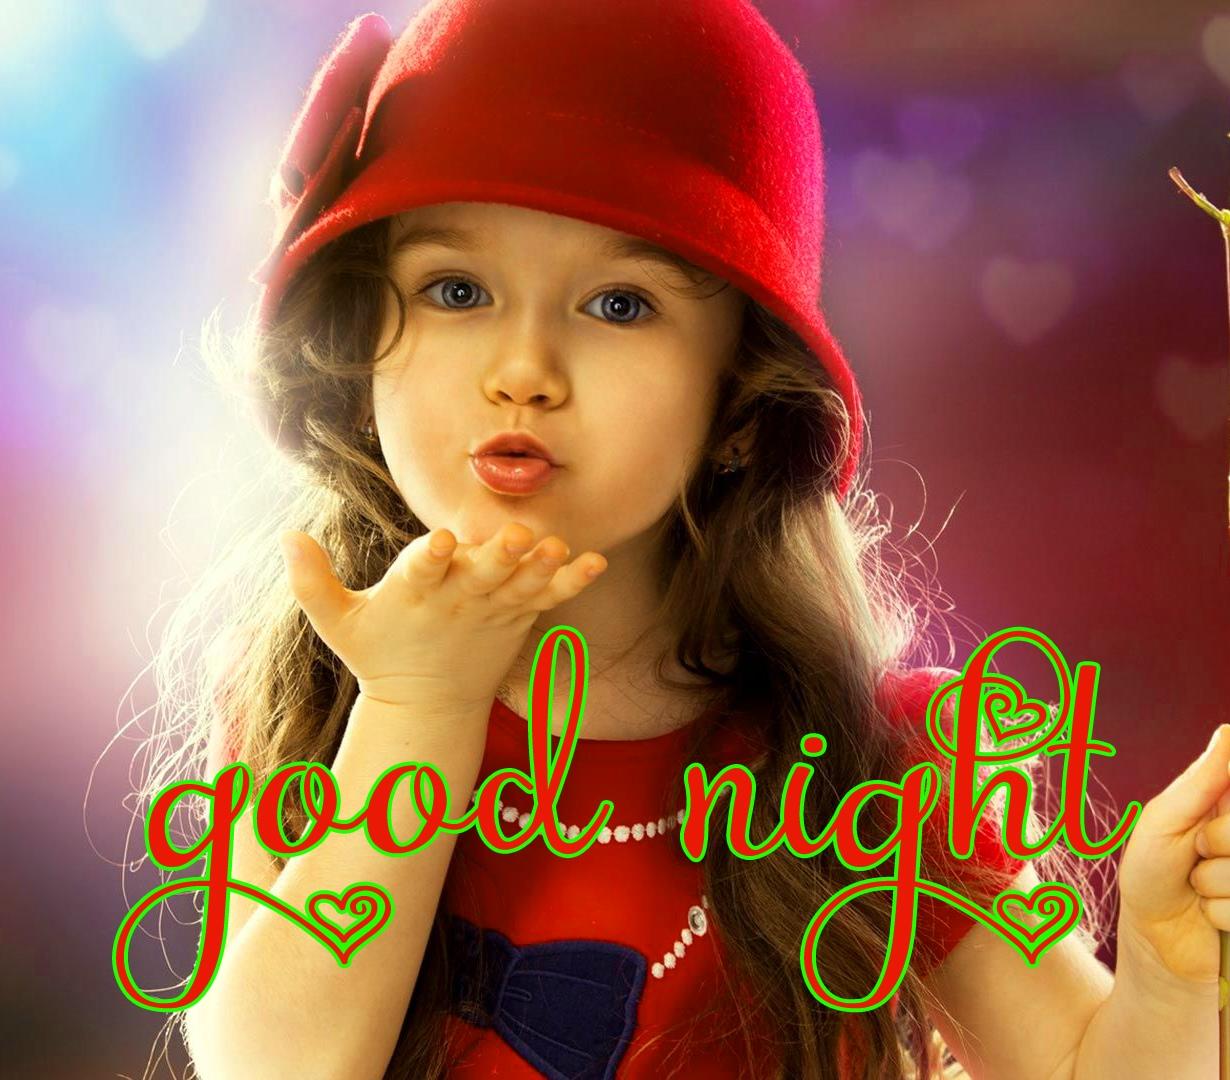 Free good night Images 26